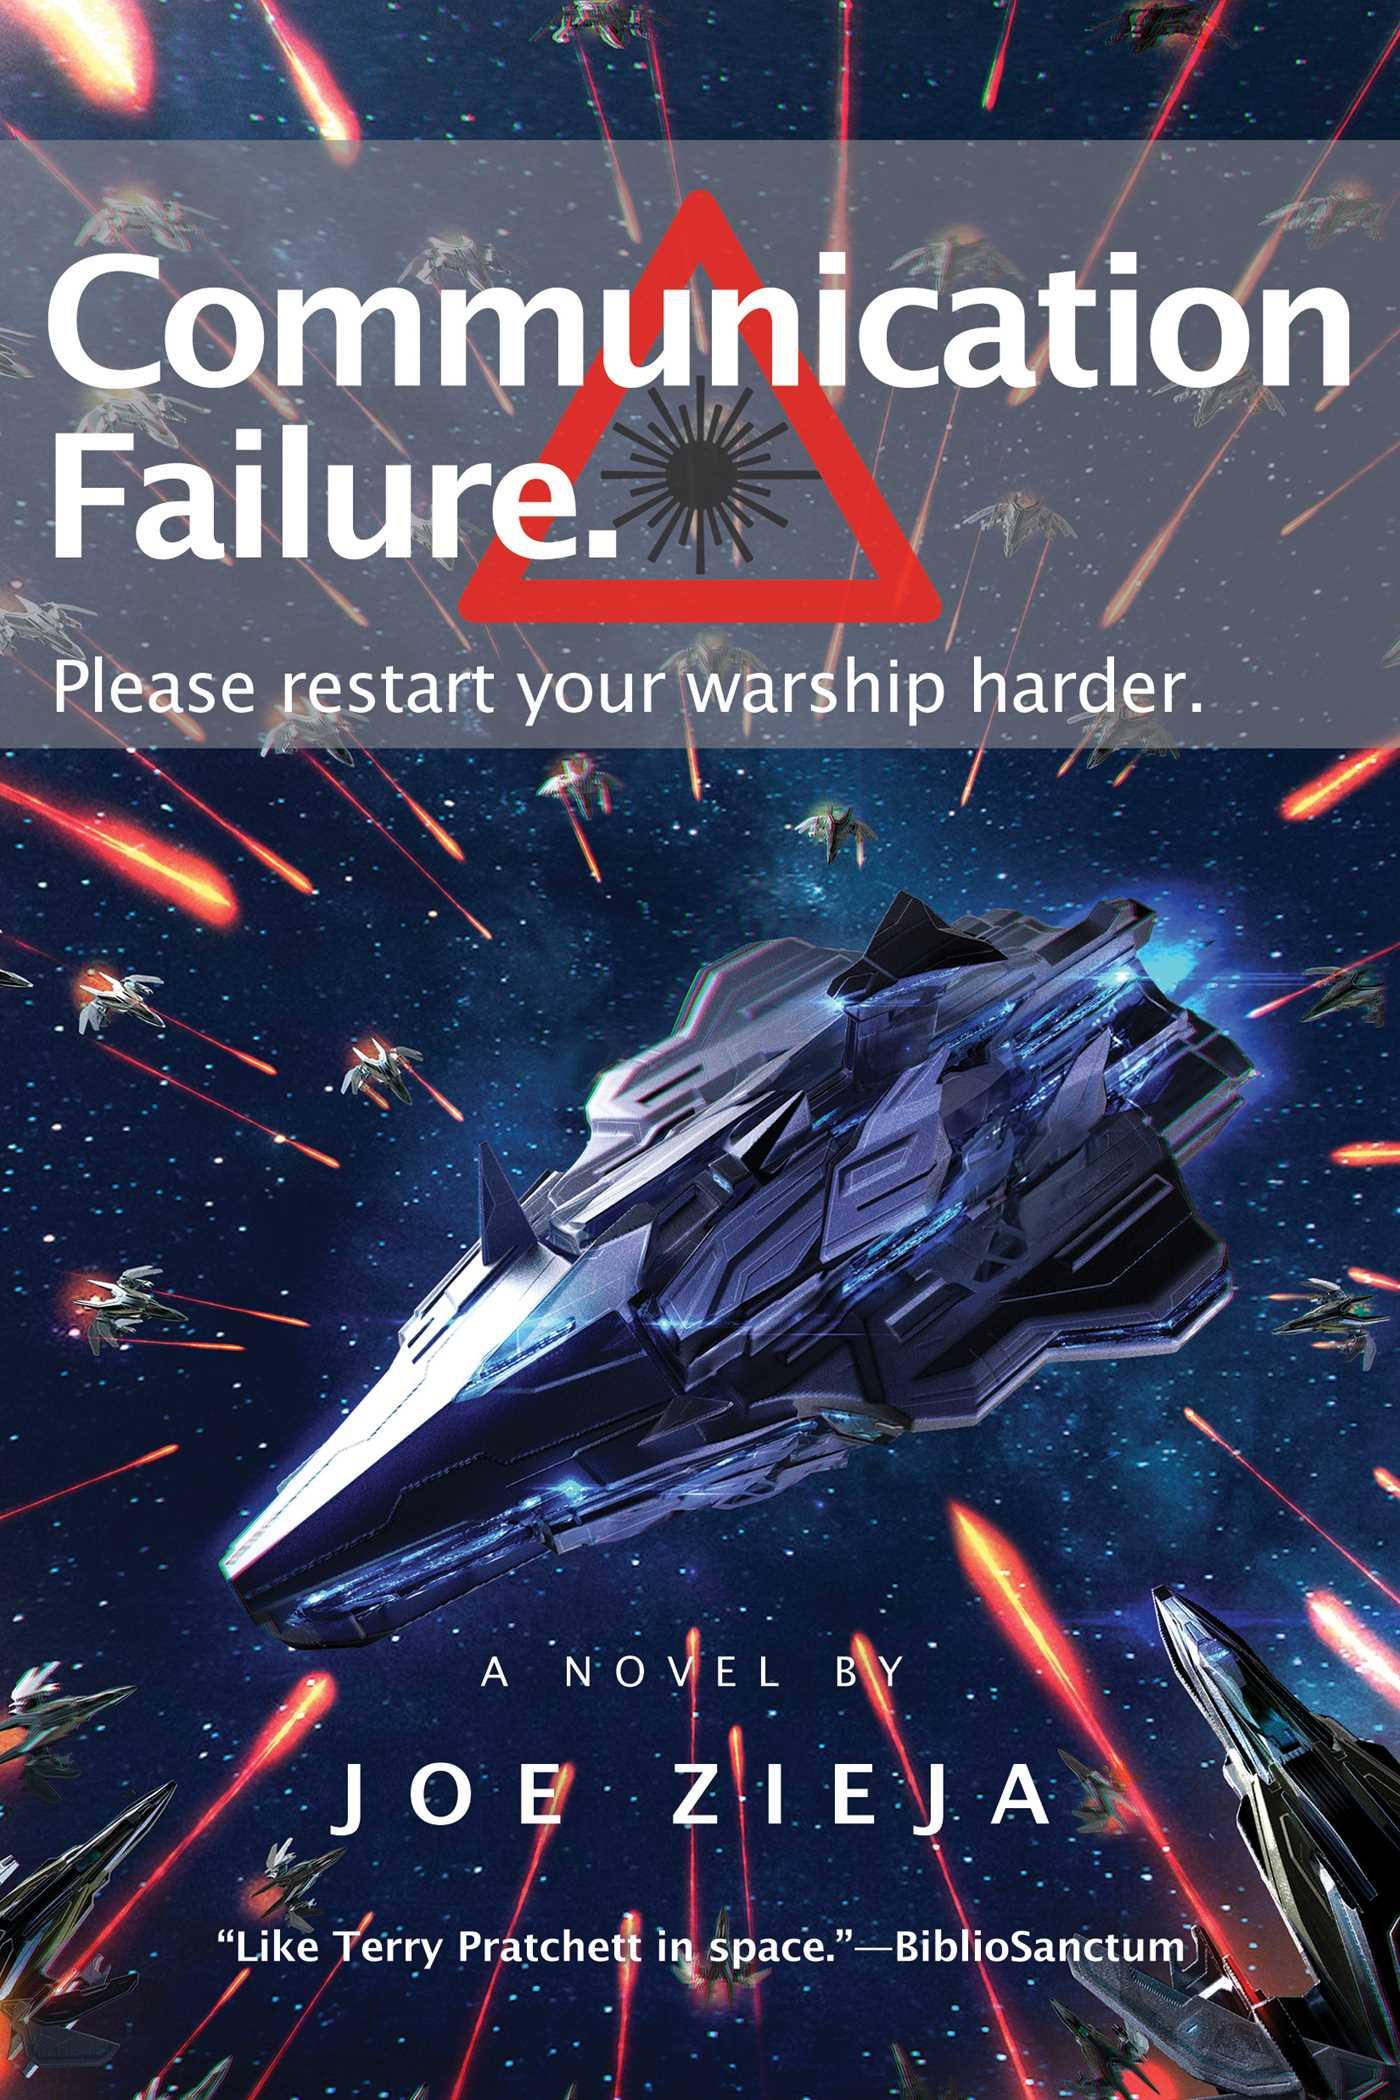 Communication failure 9781481486903 hr